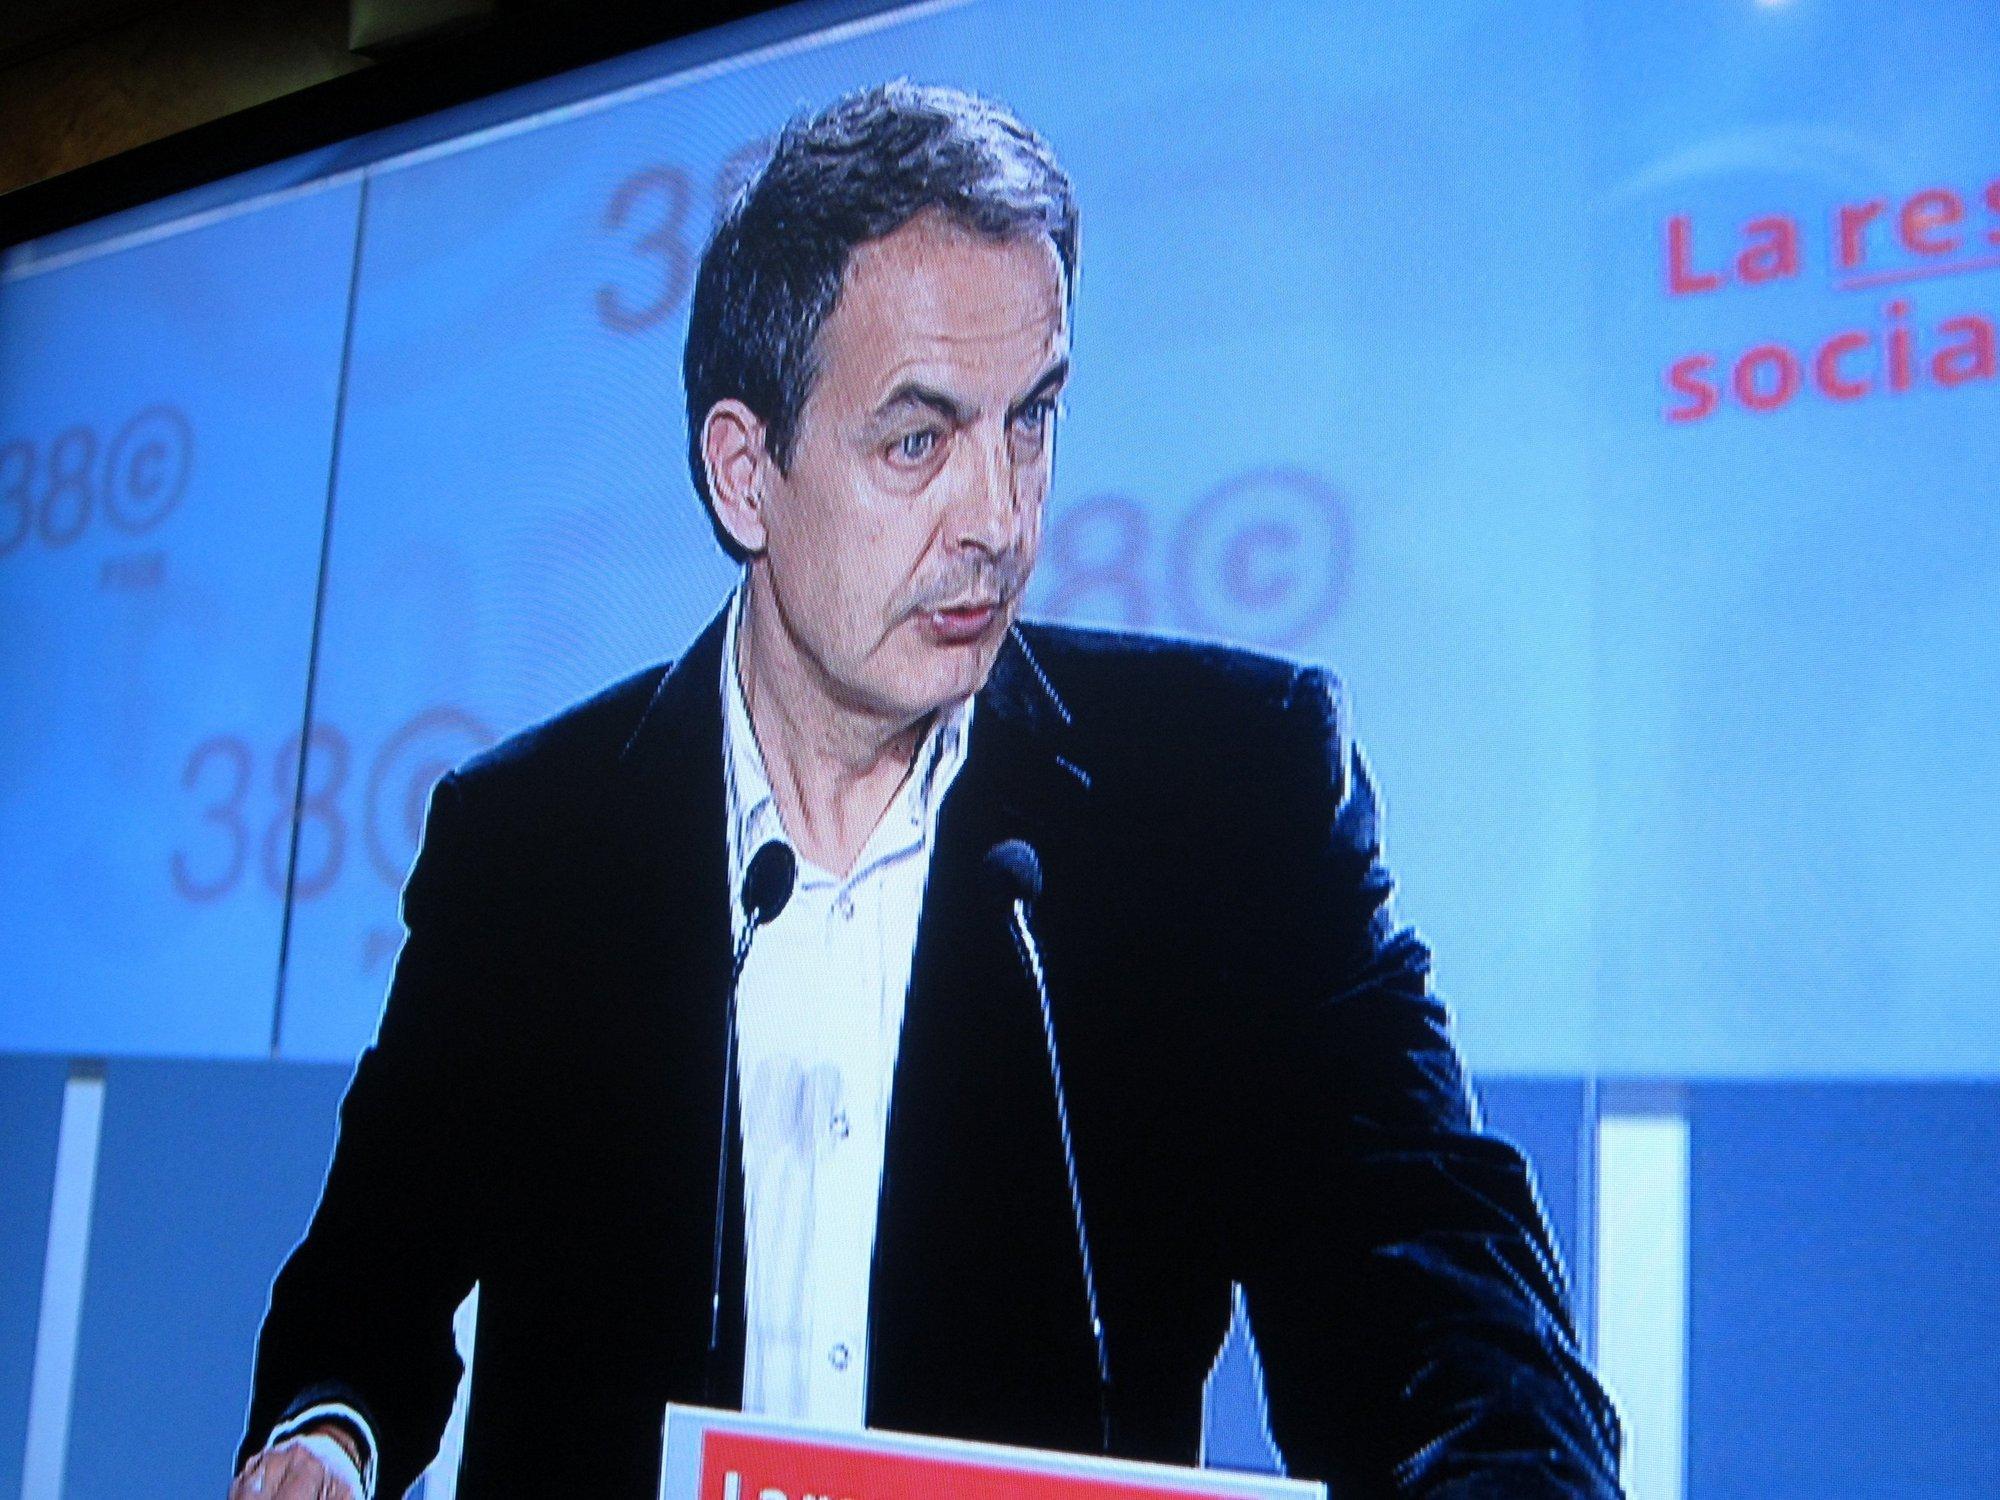 Zapatero participará en un acto de la Fundación IDEAS con partidos latinoamericanos que clausurará Rubalcaba